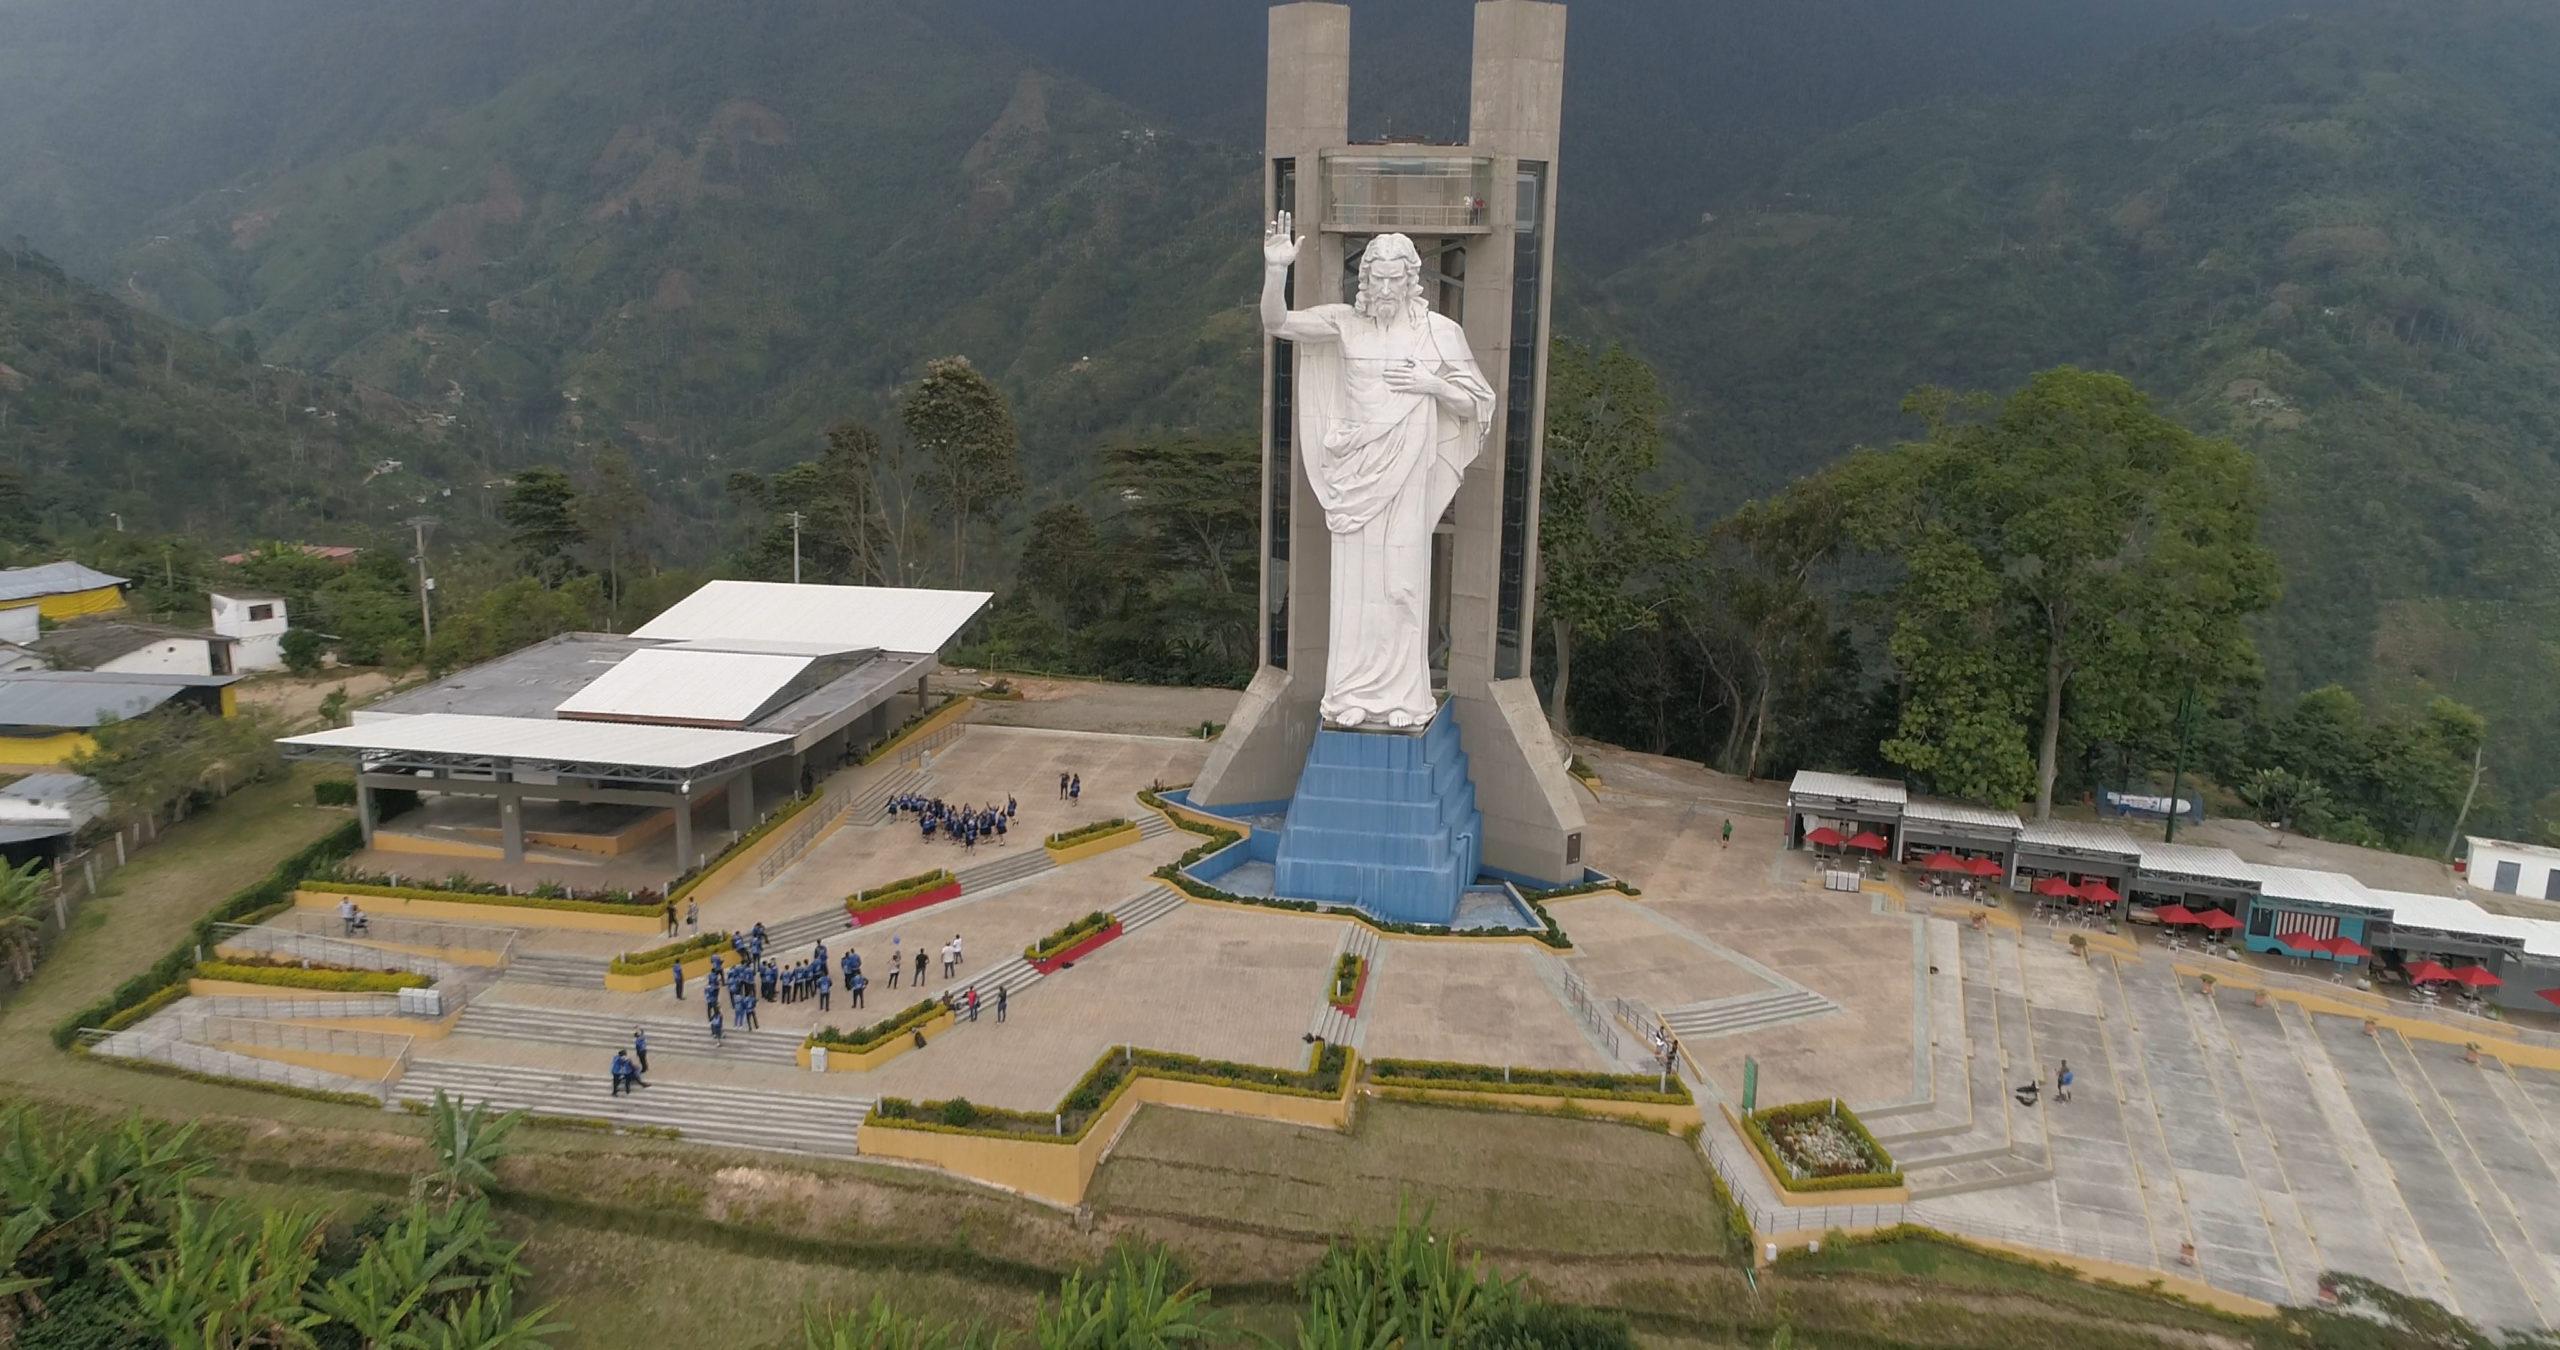 Medellín, the fourth smartest city in Latin America